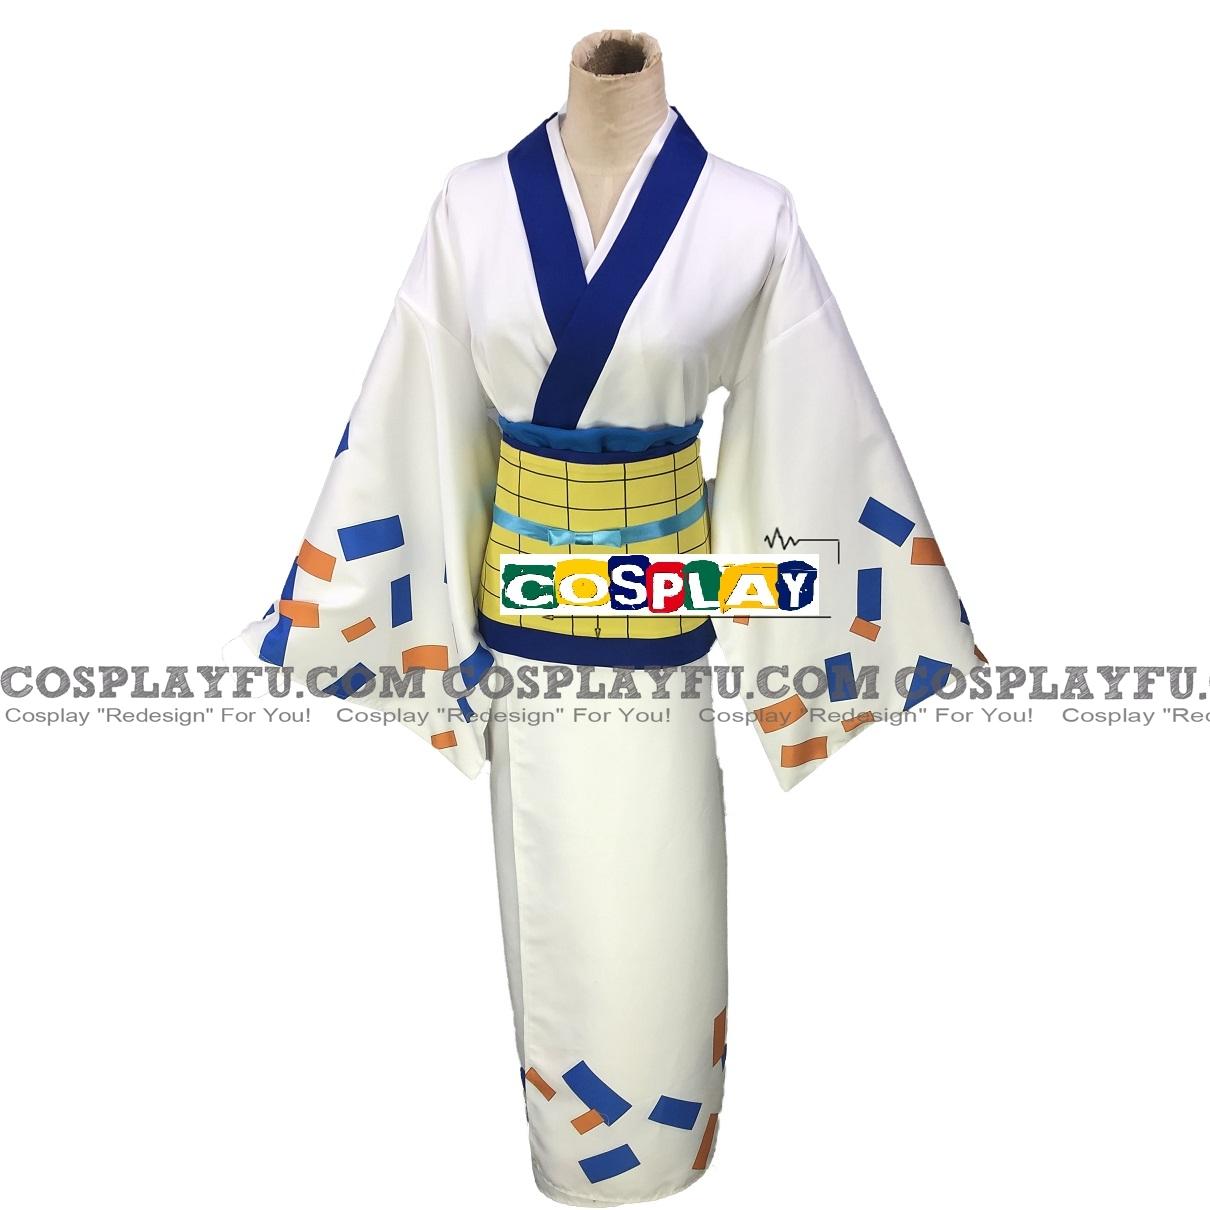 Vivi Cosplay Costume (Kimono) from One Piece